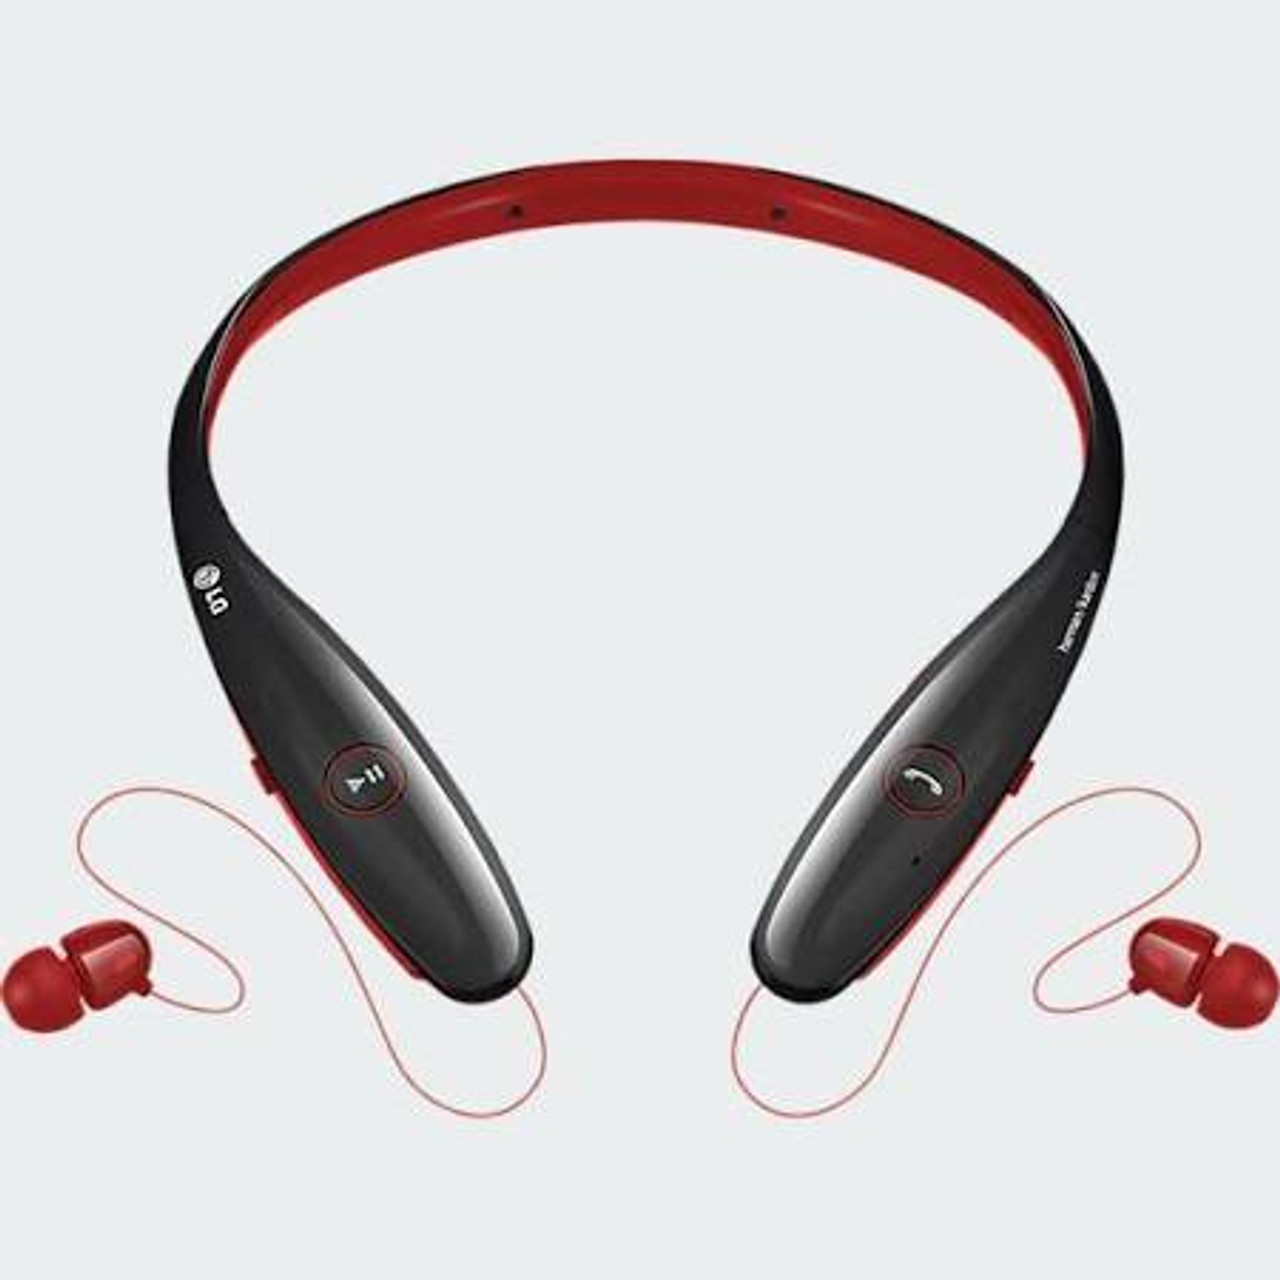 Red Lg Hbs 900 Tone Infinim Bluetooth Headset Esurebuy Com